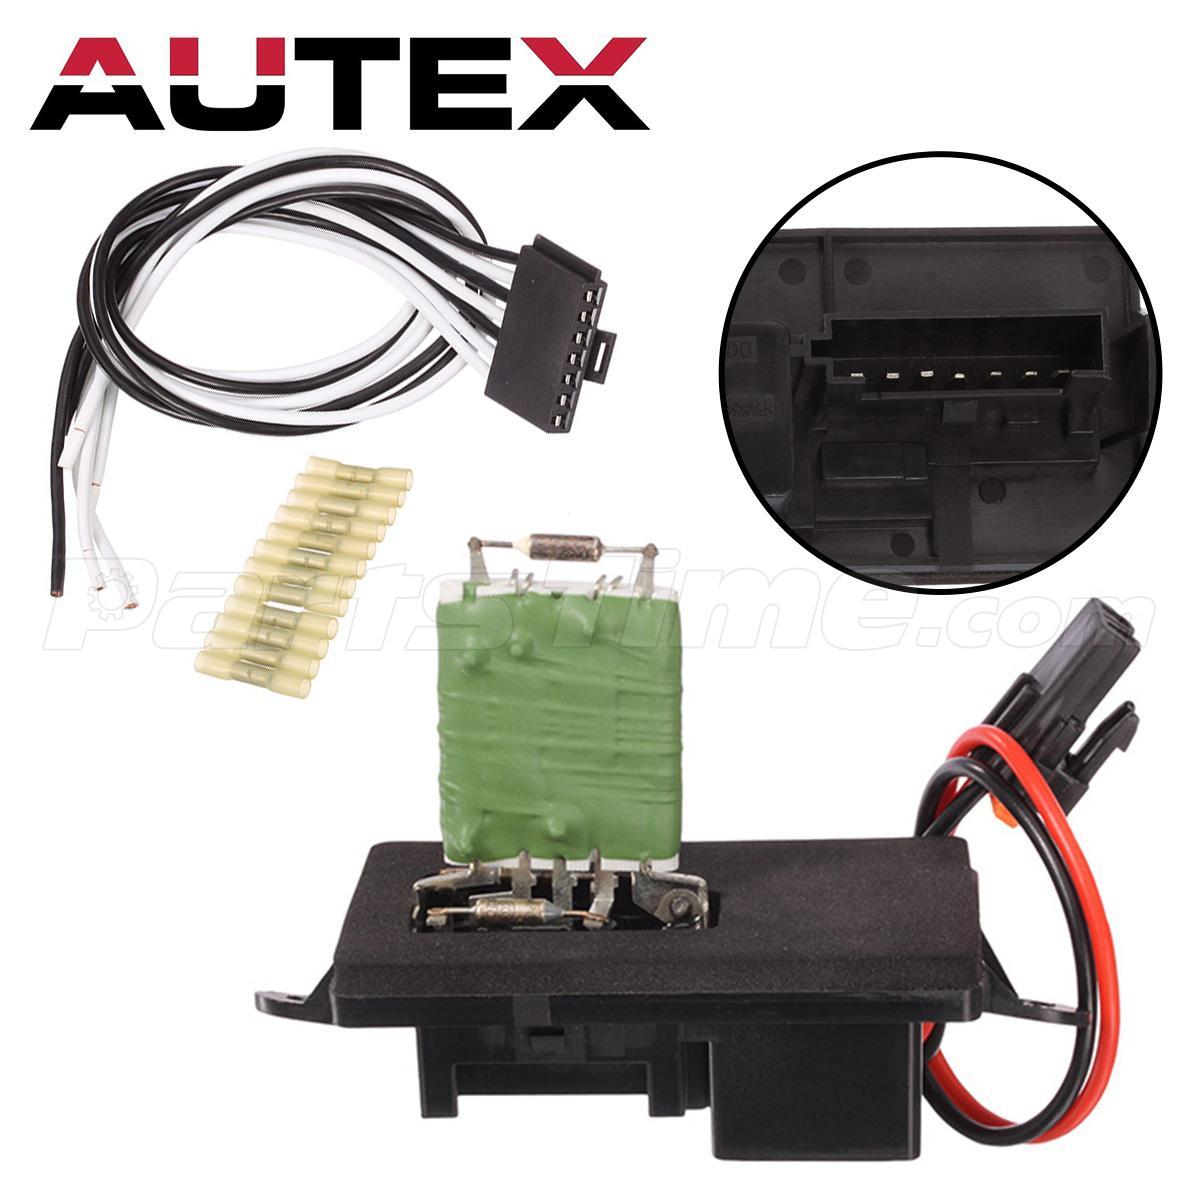 Ac Blower Motor Resistor Wiring Harness Electrical Diagrams C4500 Diagram 2004 Dodge Dakota 54 2006 Gmc